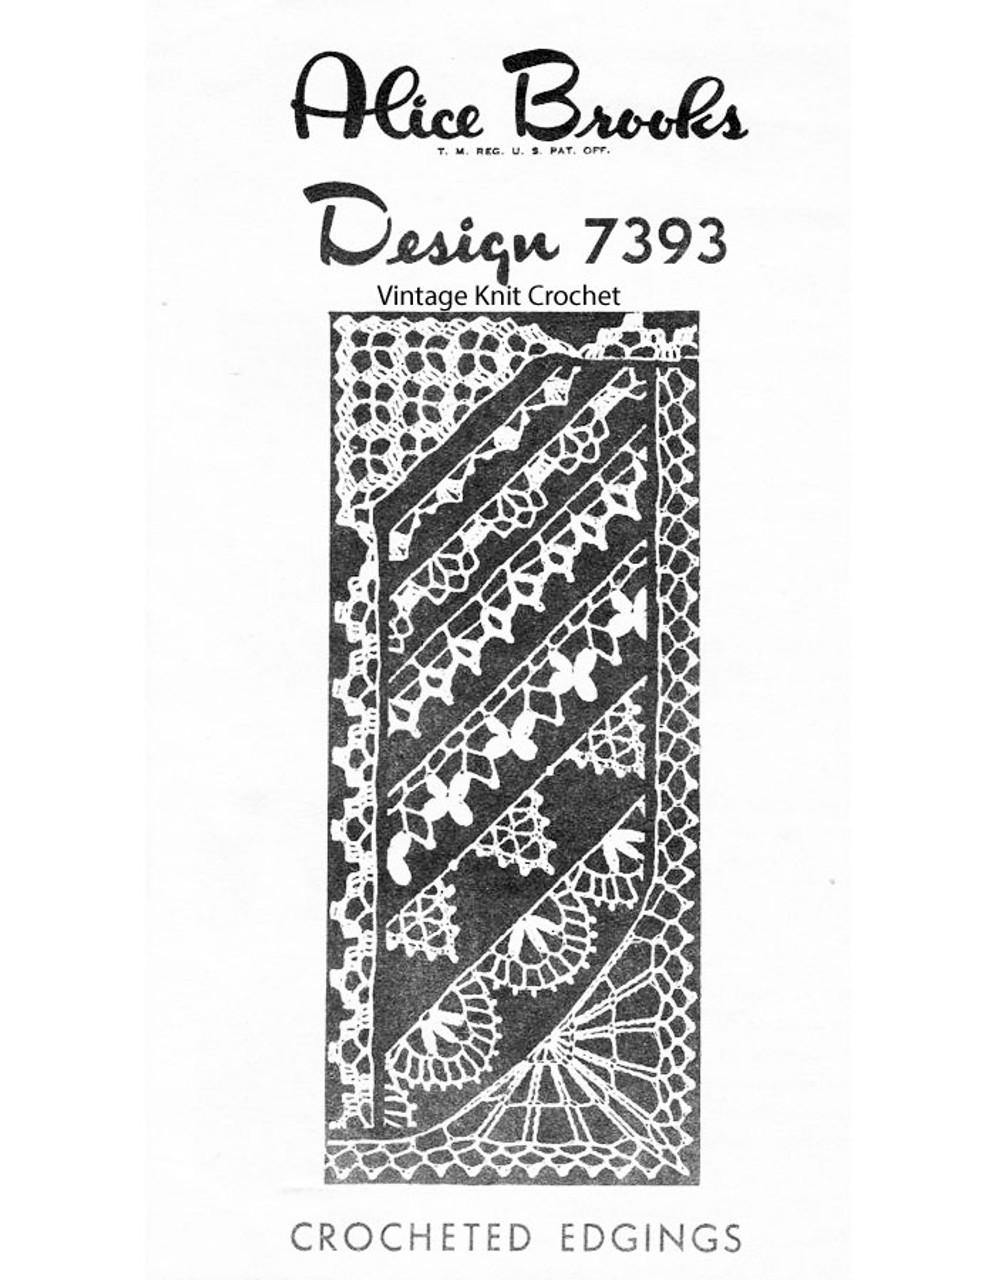 Vintage Crochet Edgings Pattern, Mail Order Design 7393